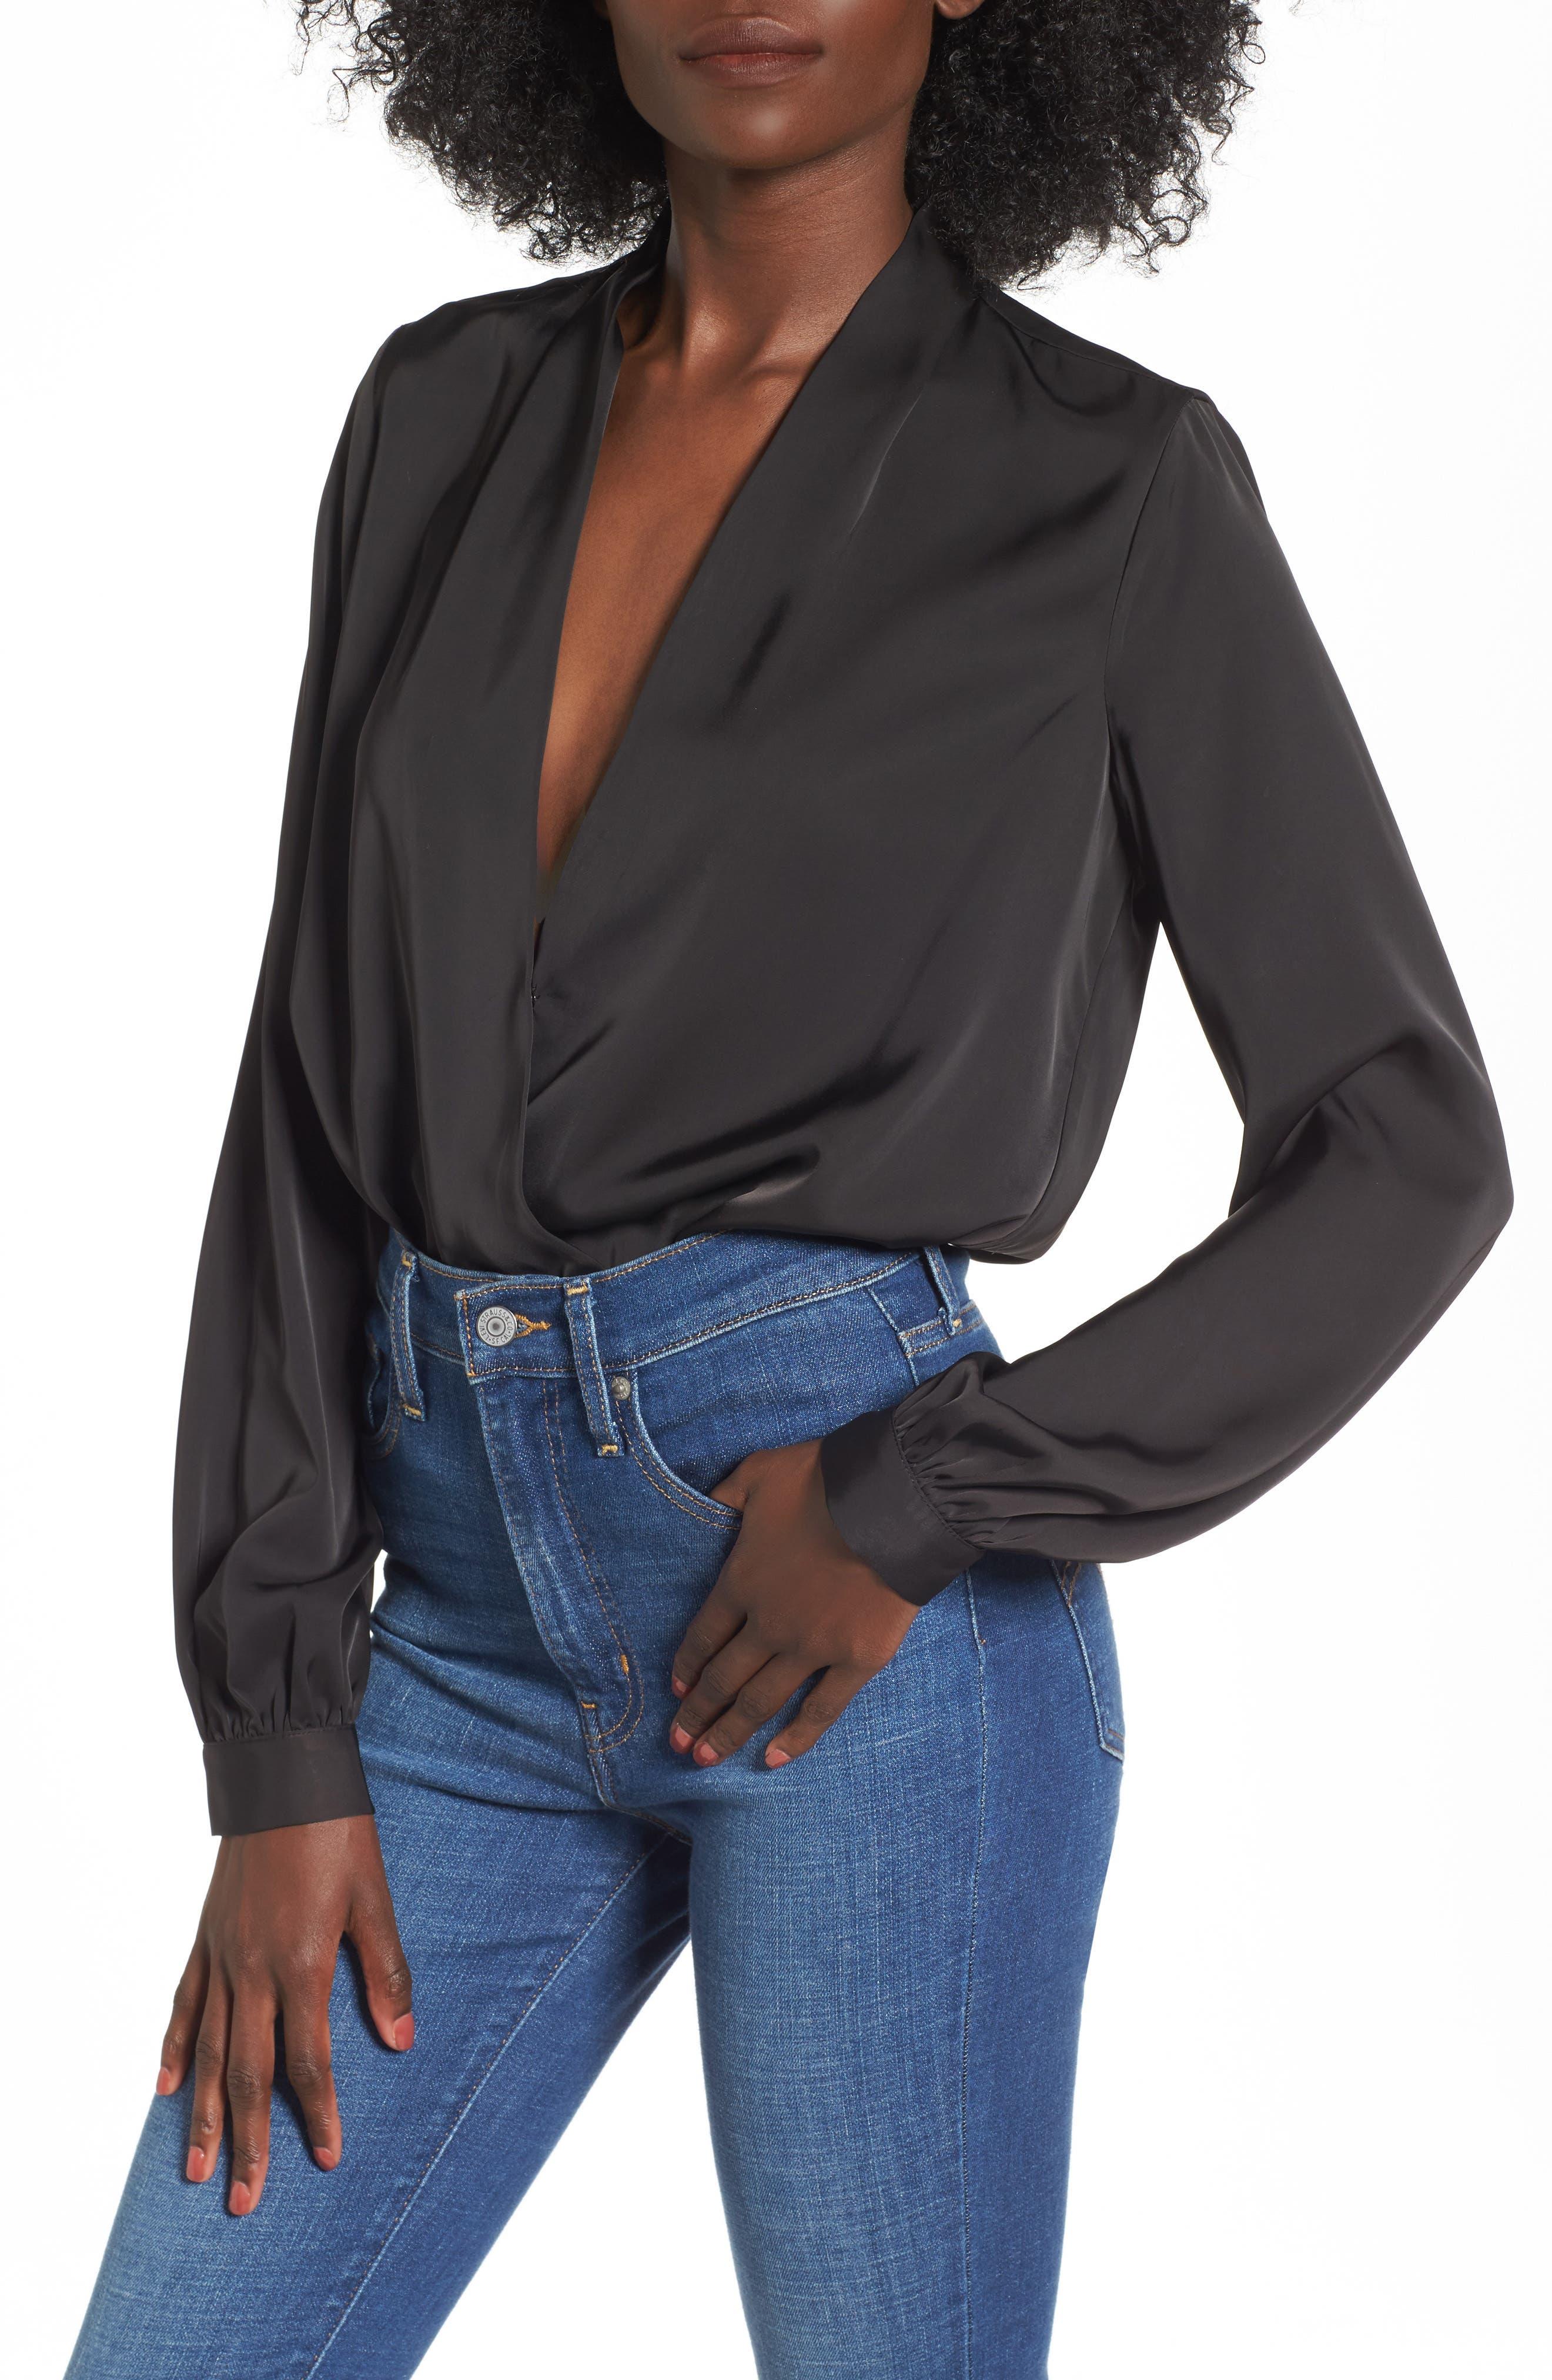 Alternate Image 1 Selected - L'Academie The Long Sleeve Bodysuit